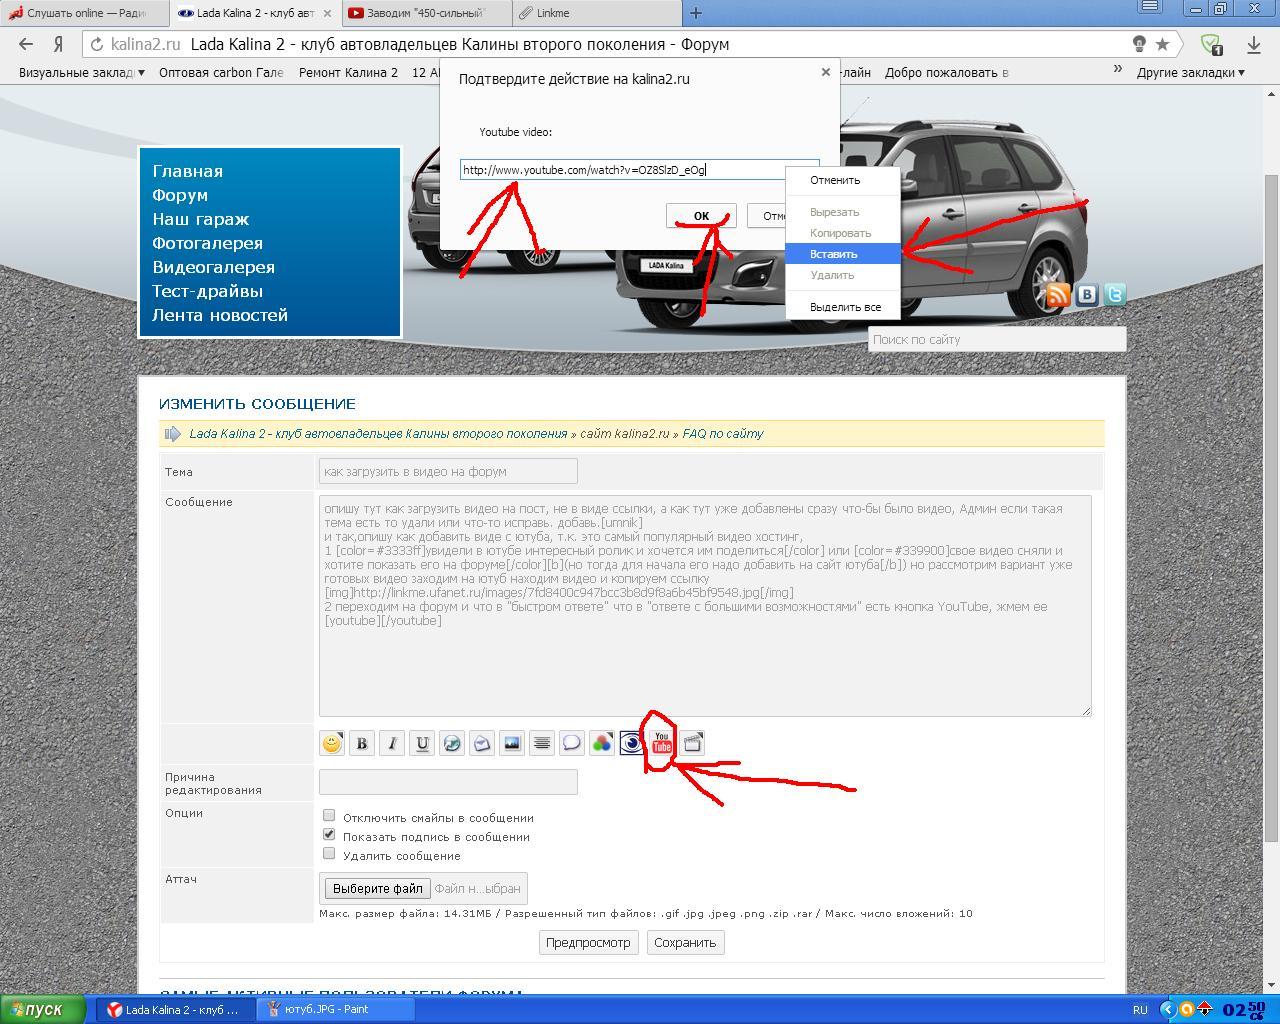 linkme.ufanet.ru/images/76b7c65bd8e5c0821211797cc7e22ef9.jpg